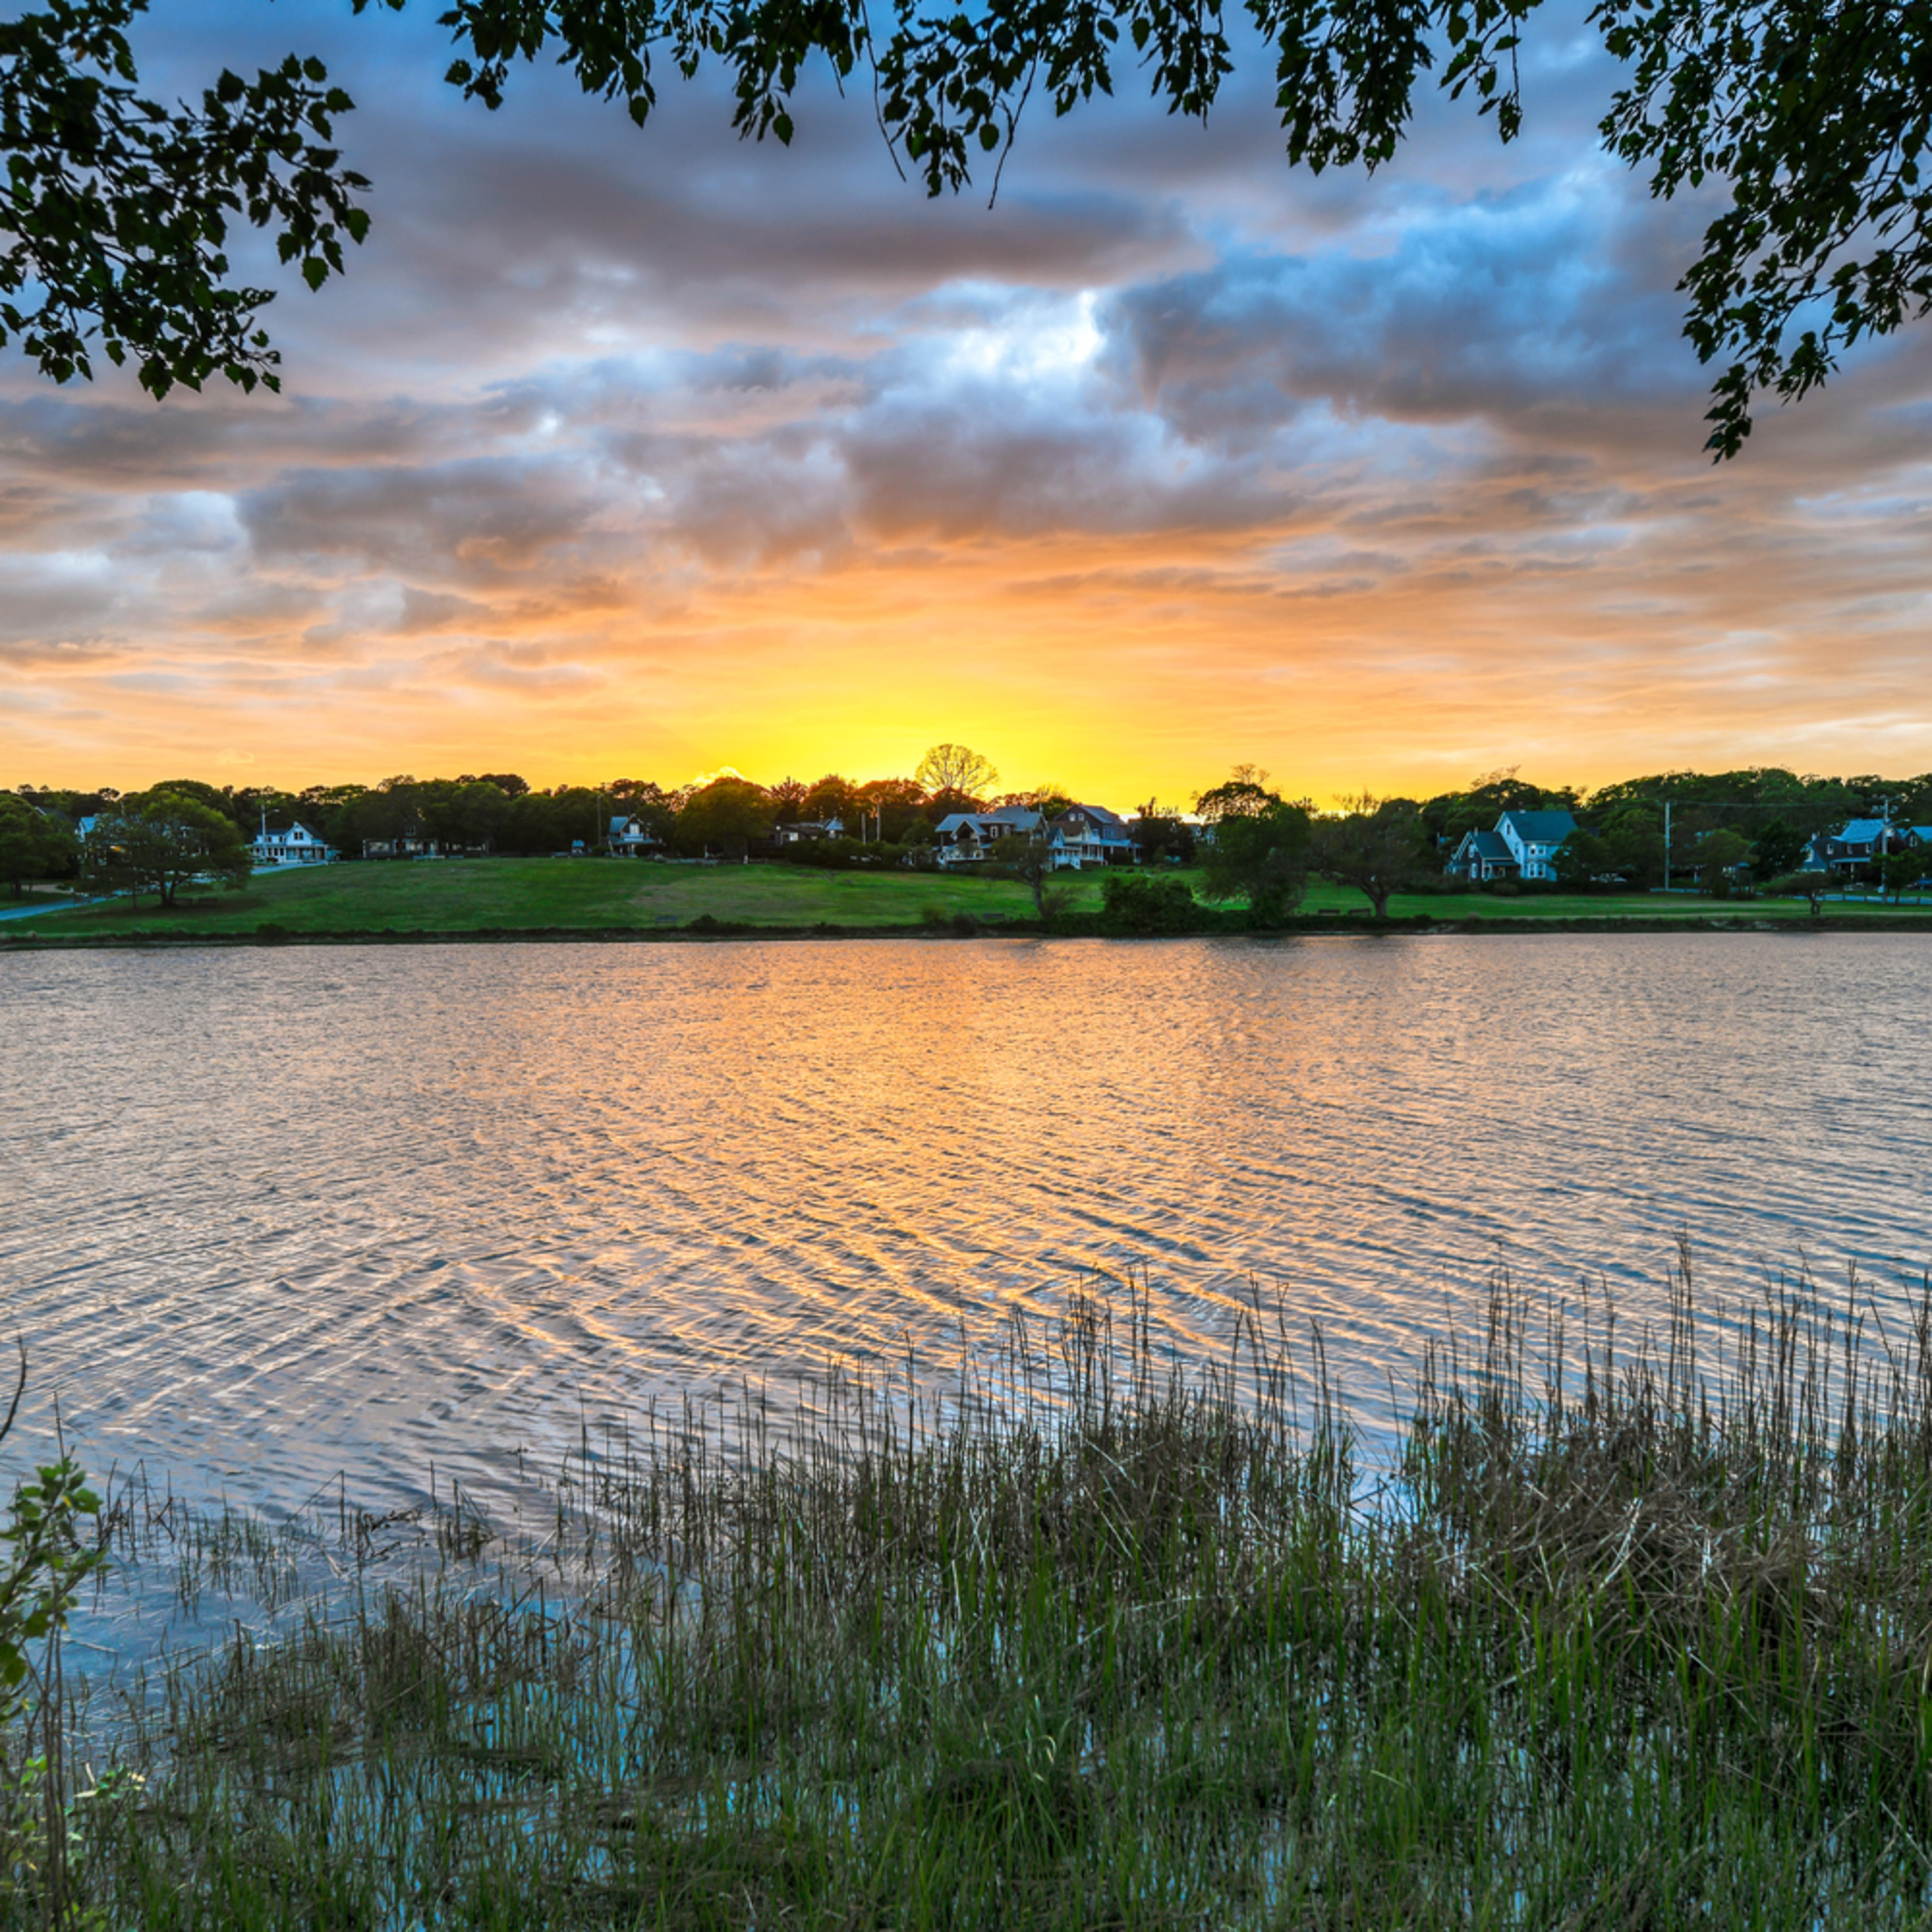 Sunset lake spring 1 pojhhx